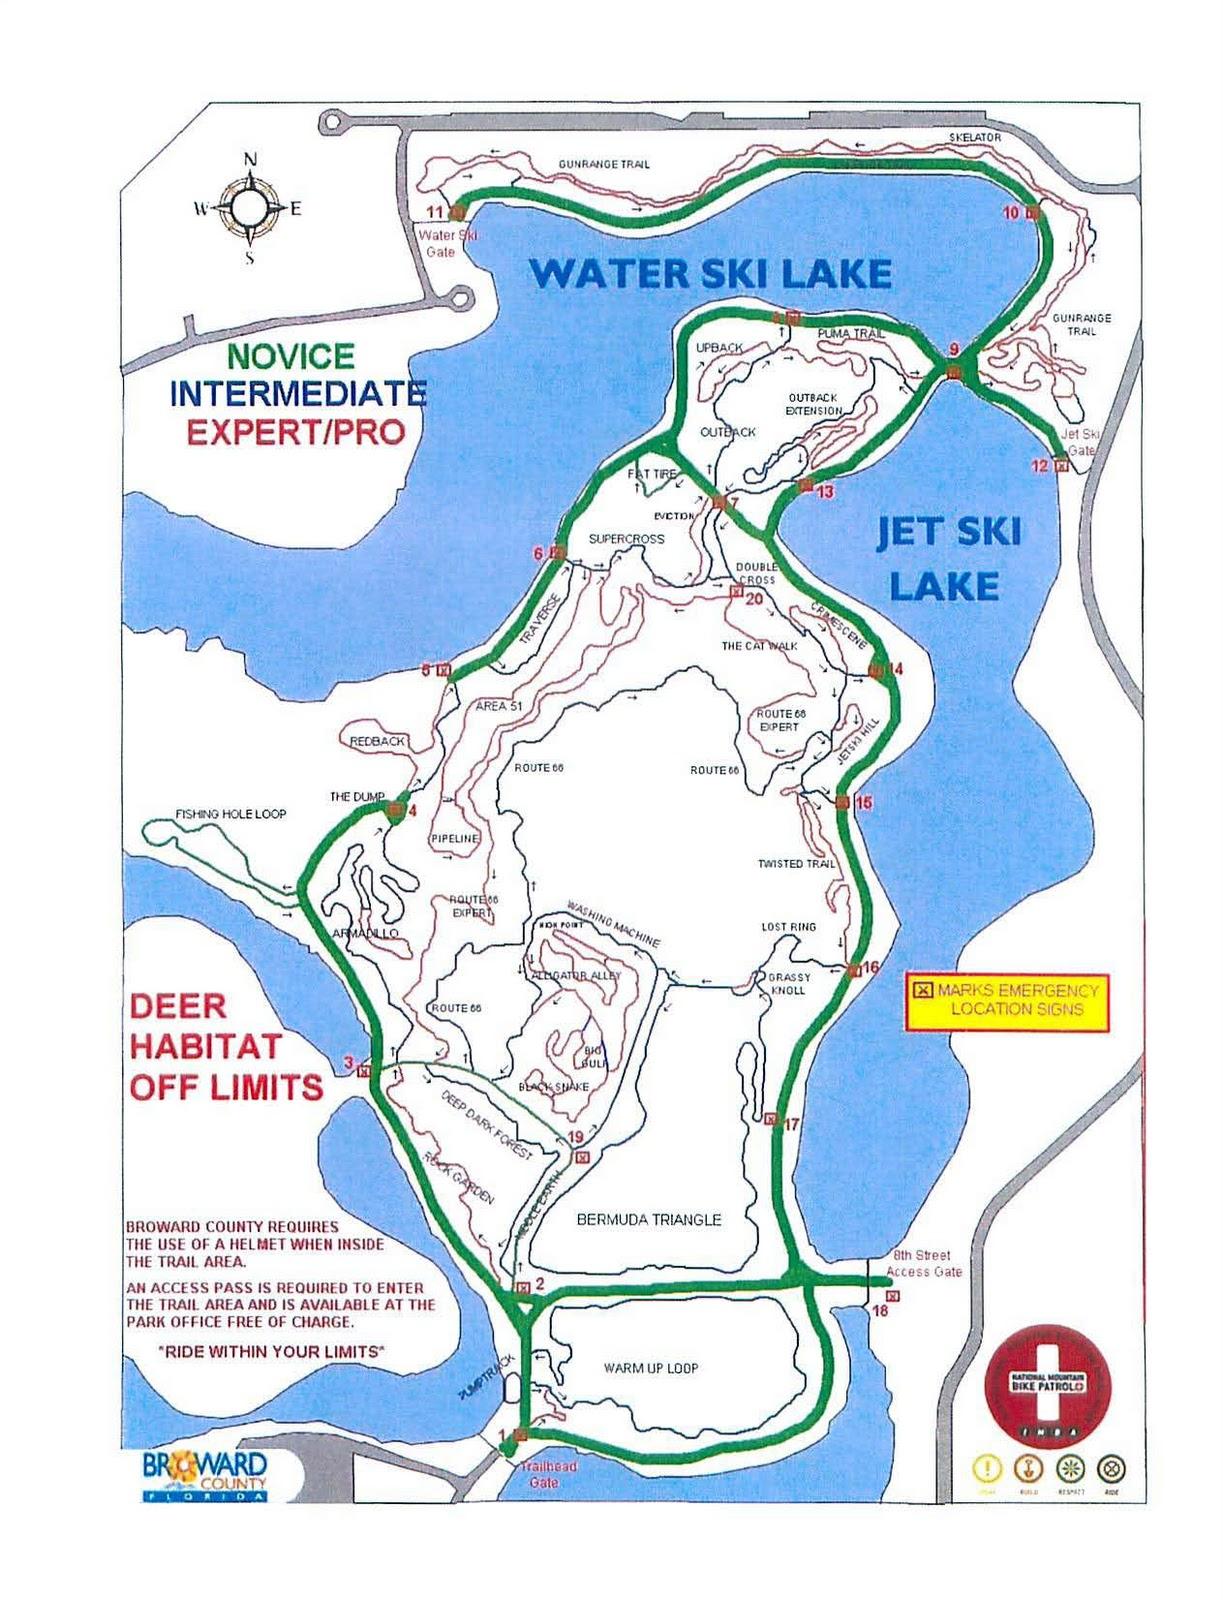 Fl Trails   Florida Mountain Bike Trails: Markham Park - Florida Mountain Bike Trails Map